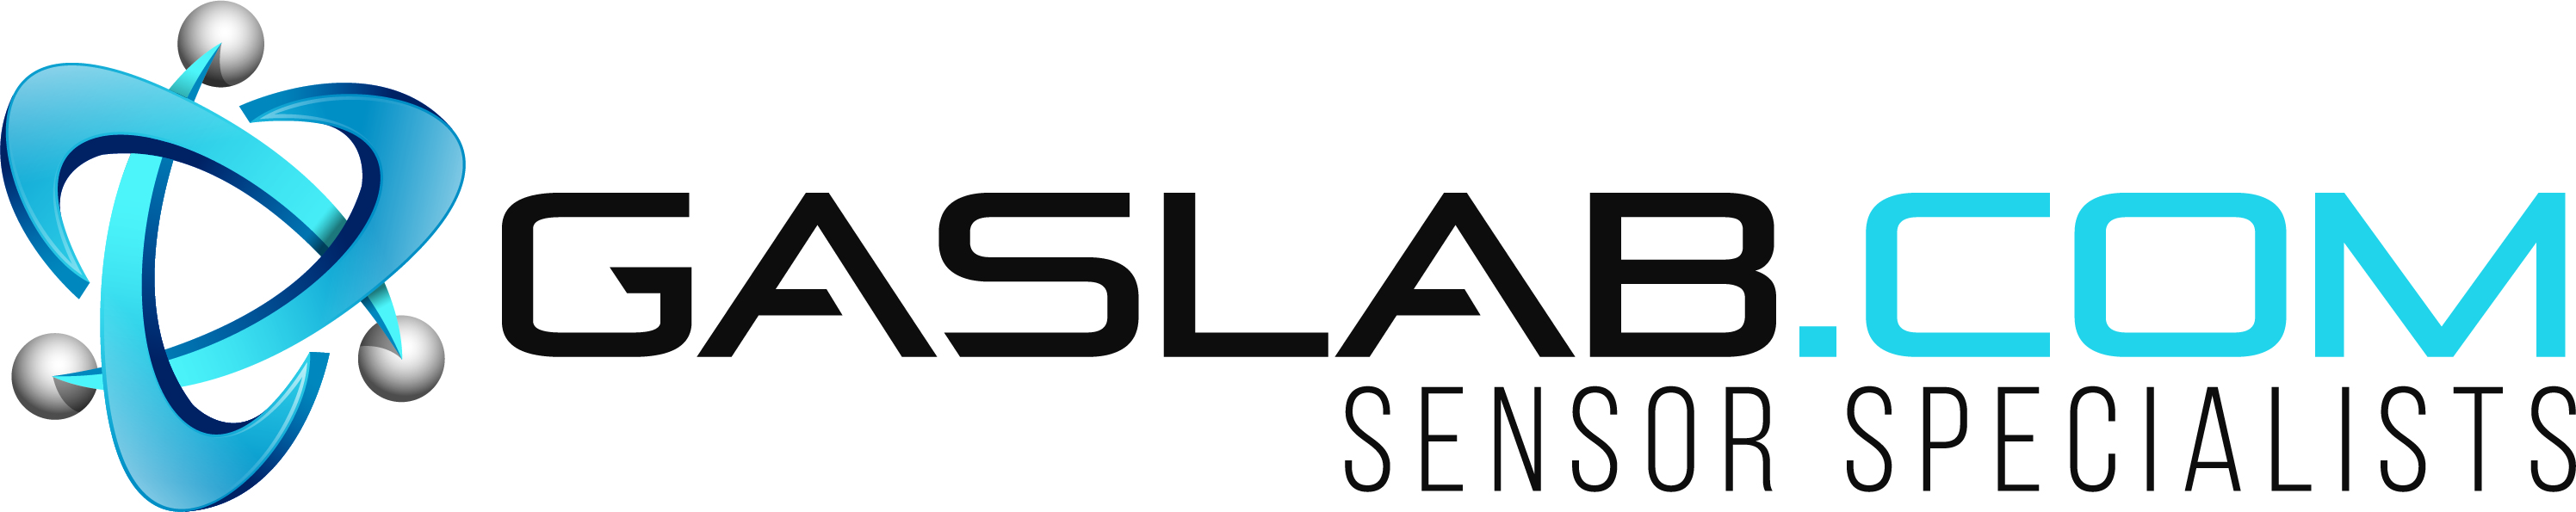 Gaslab Sensor Specialists